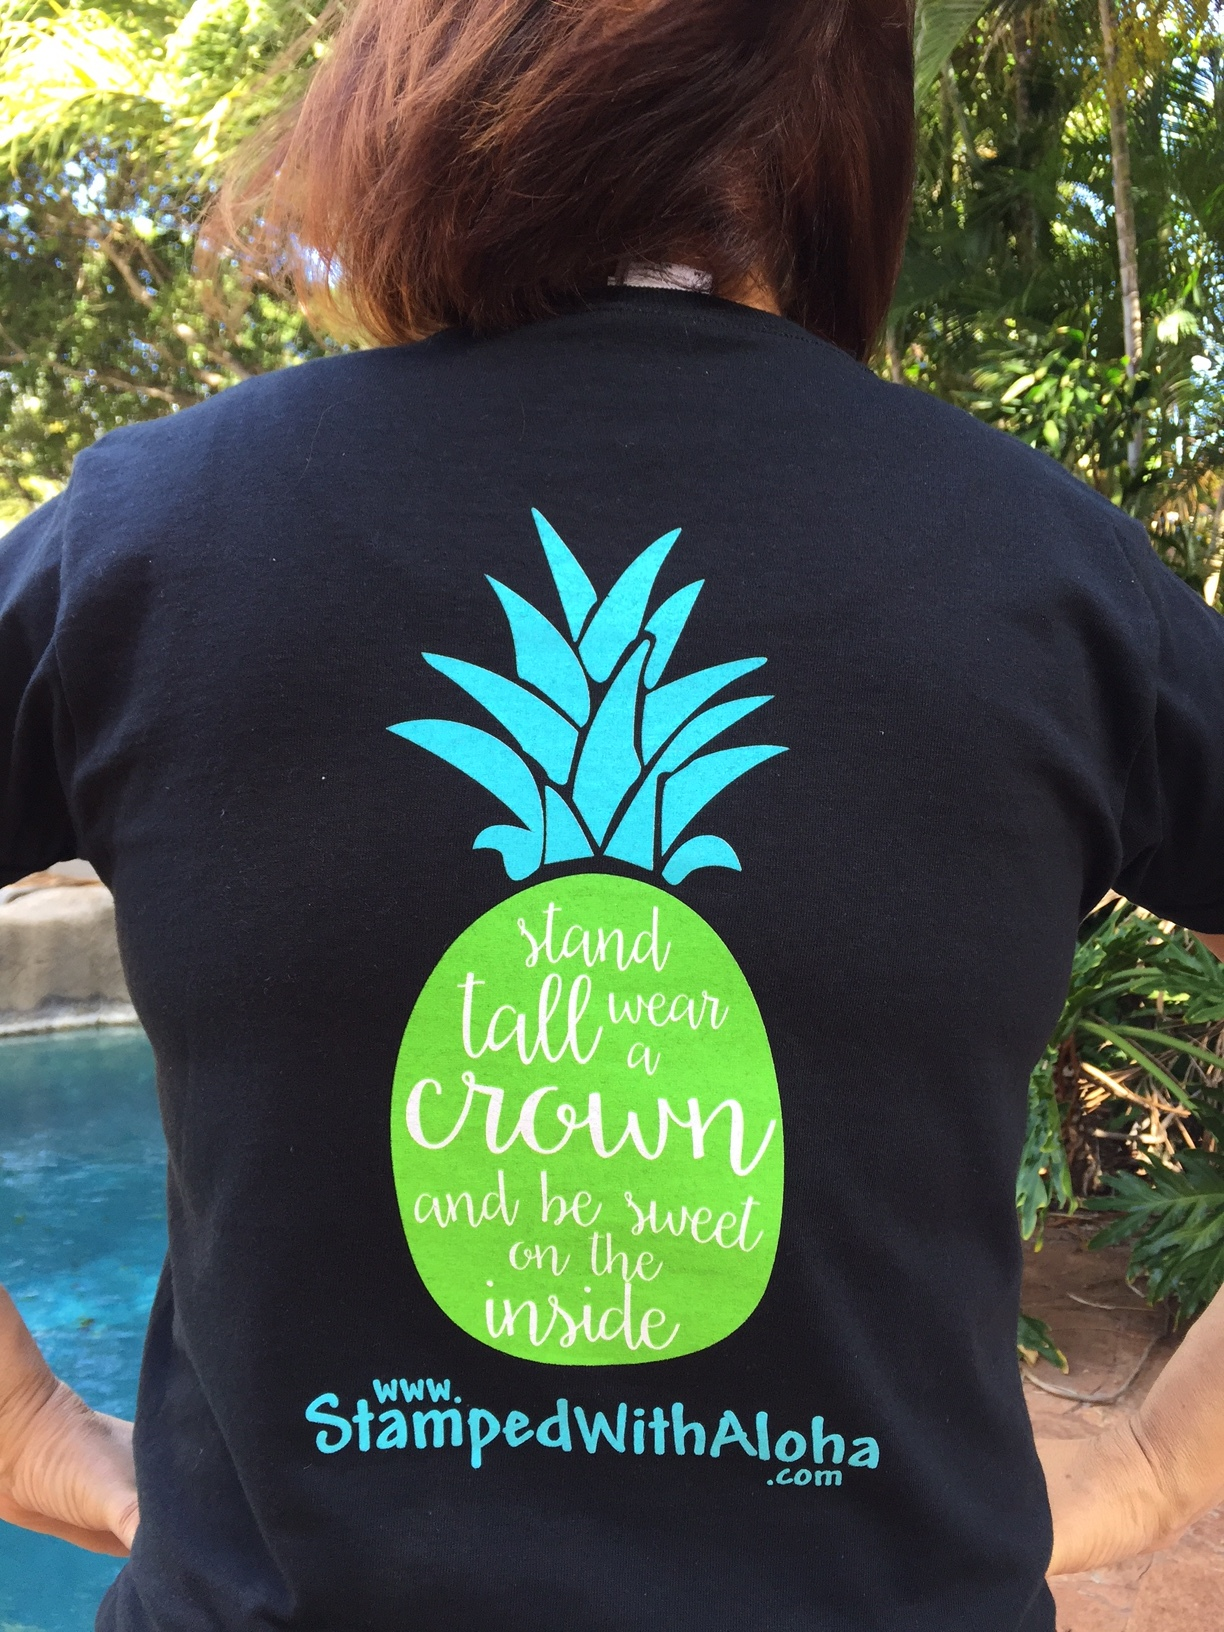 Stamped With Aloha T-Shirts - www.stampedwithaloha.com